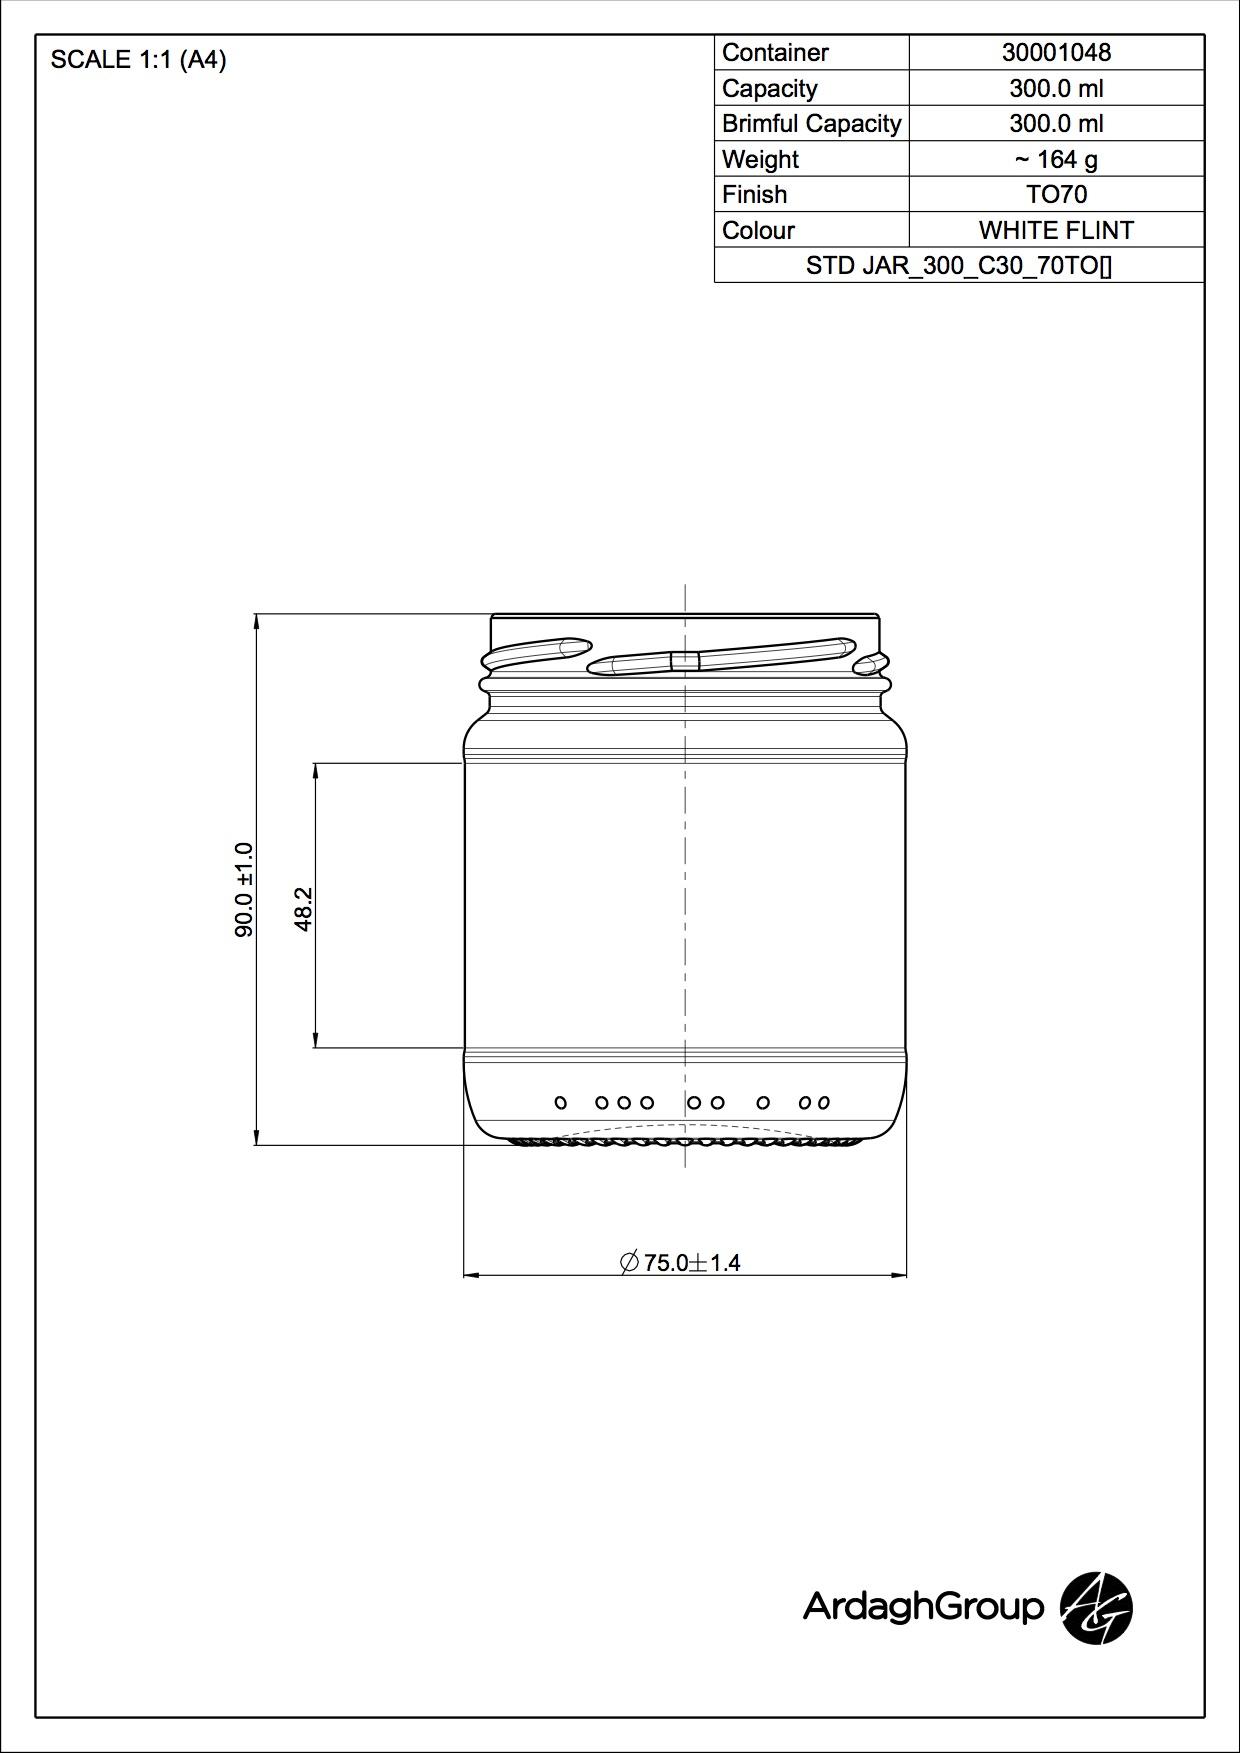 STD JAR 300 C30 70TO